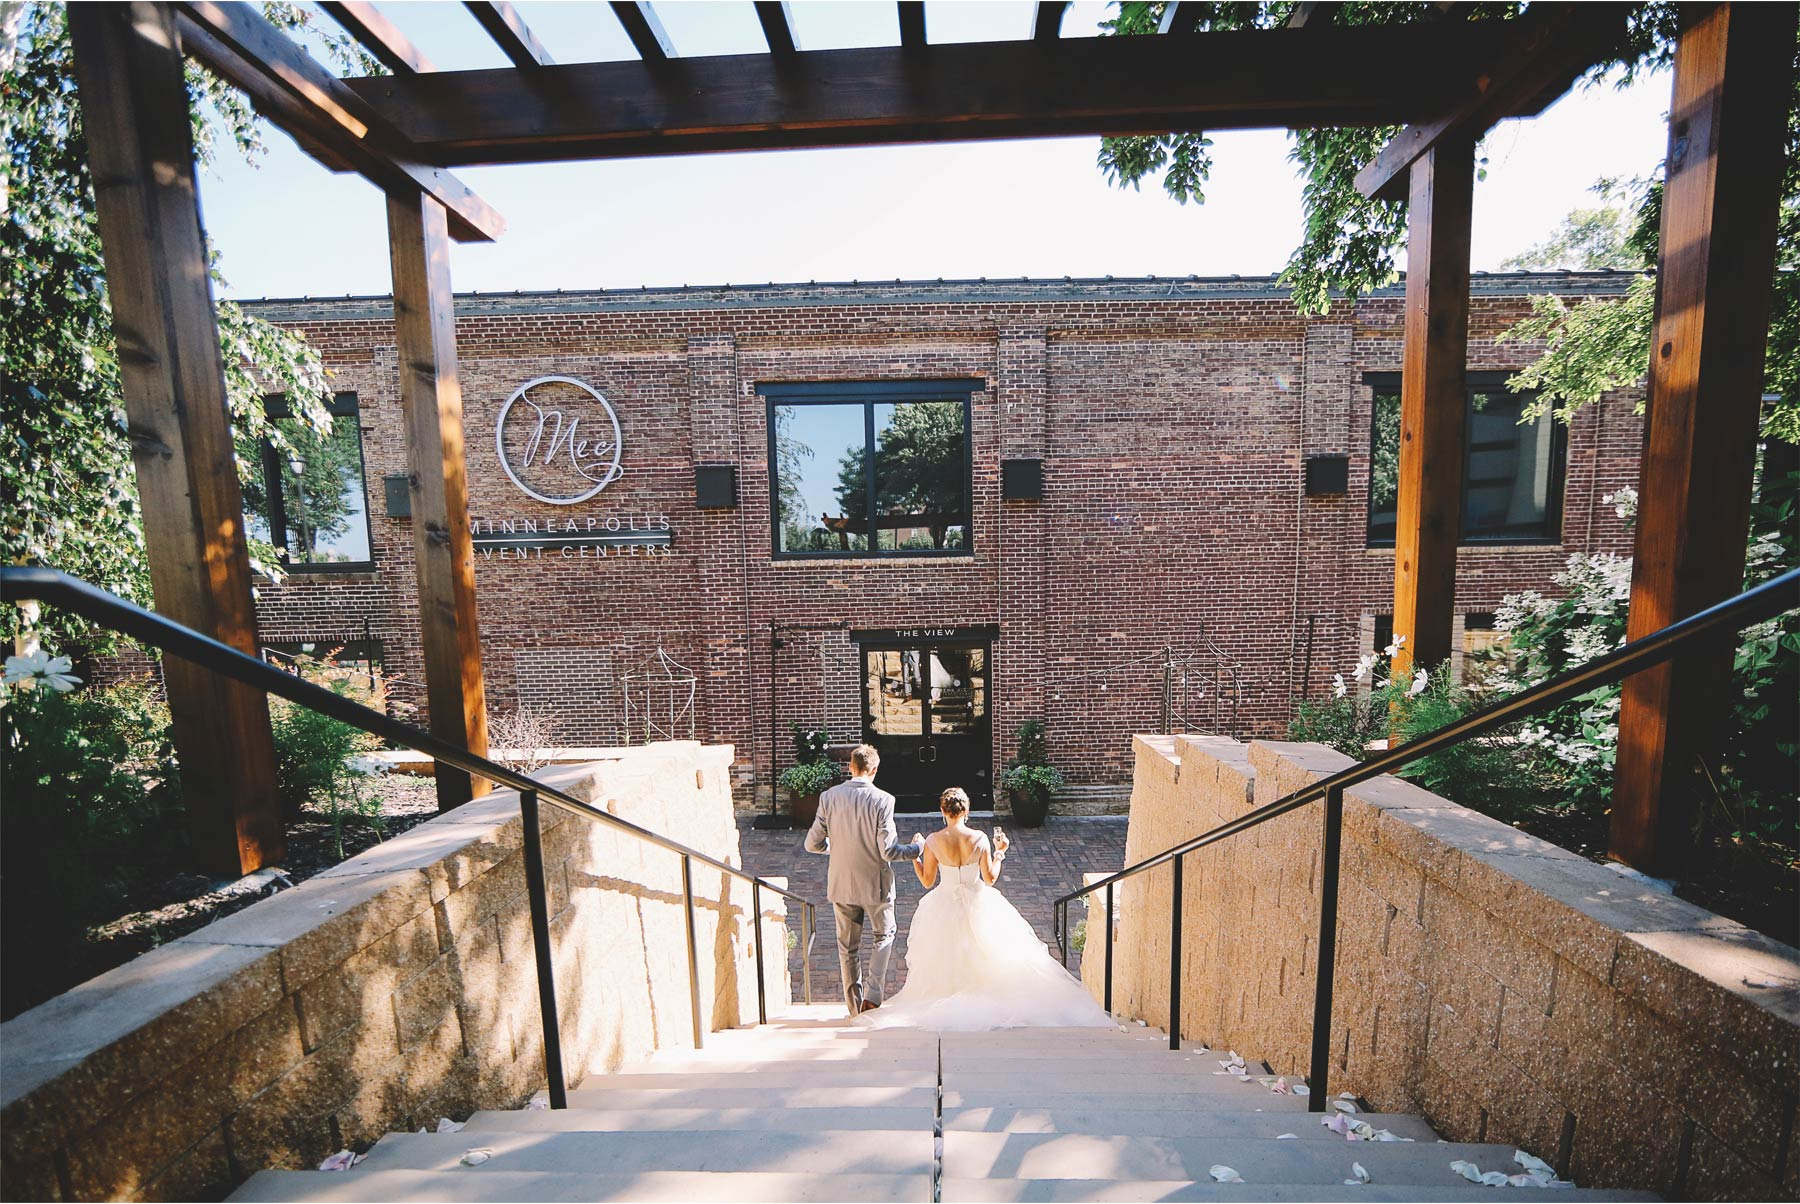 17-Minneapolis-Minnesota-Wedding-Photography-by-Vick-Photography-The-View-Minneapolis-Event-Center-Reception-Brigid-and-Ernie.jpg